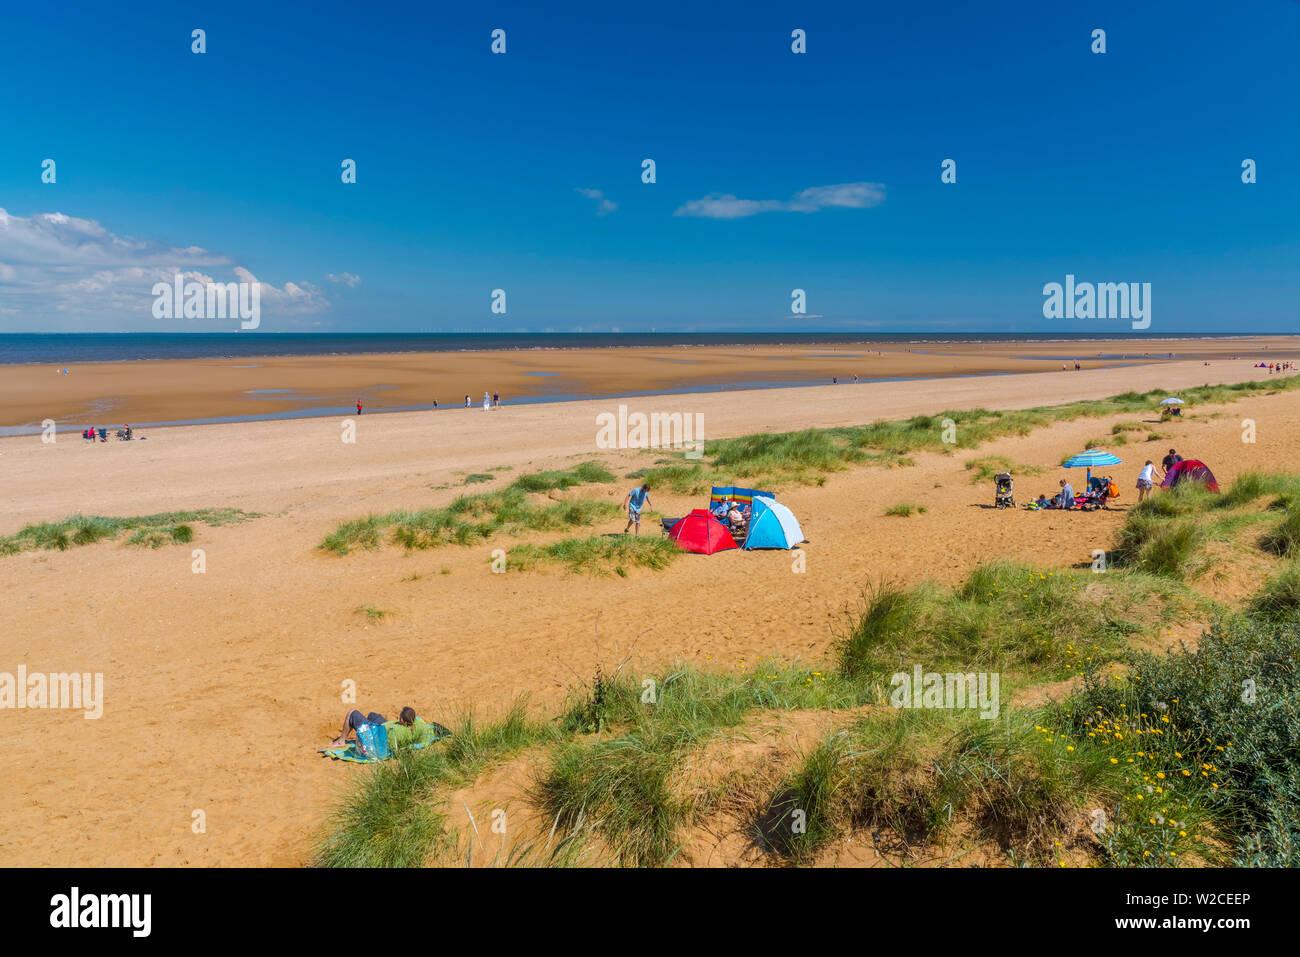 UK, England, Norfolk, Hunstanton, Old Hunstanton Beach - Stock Image